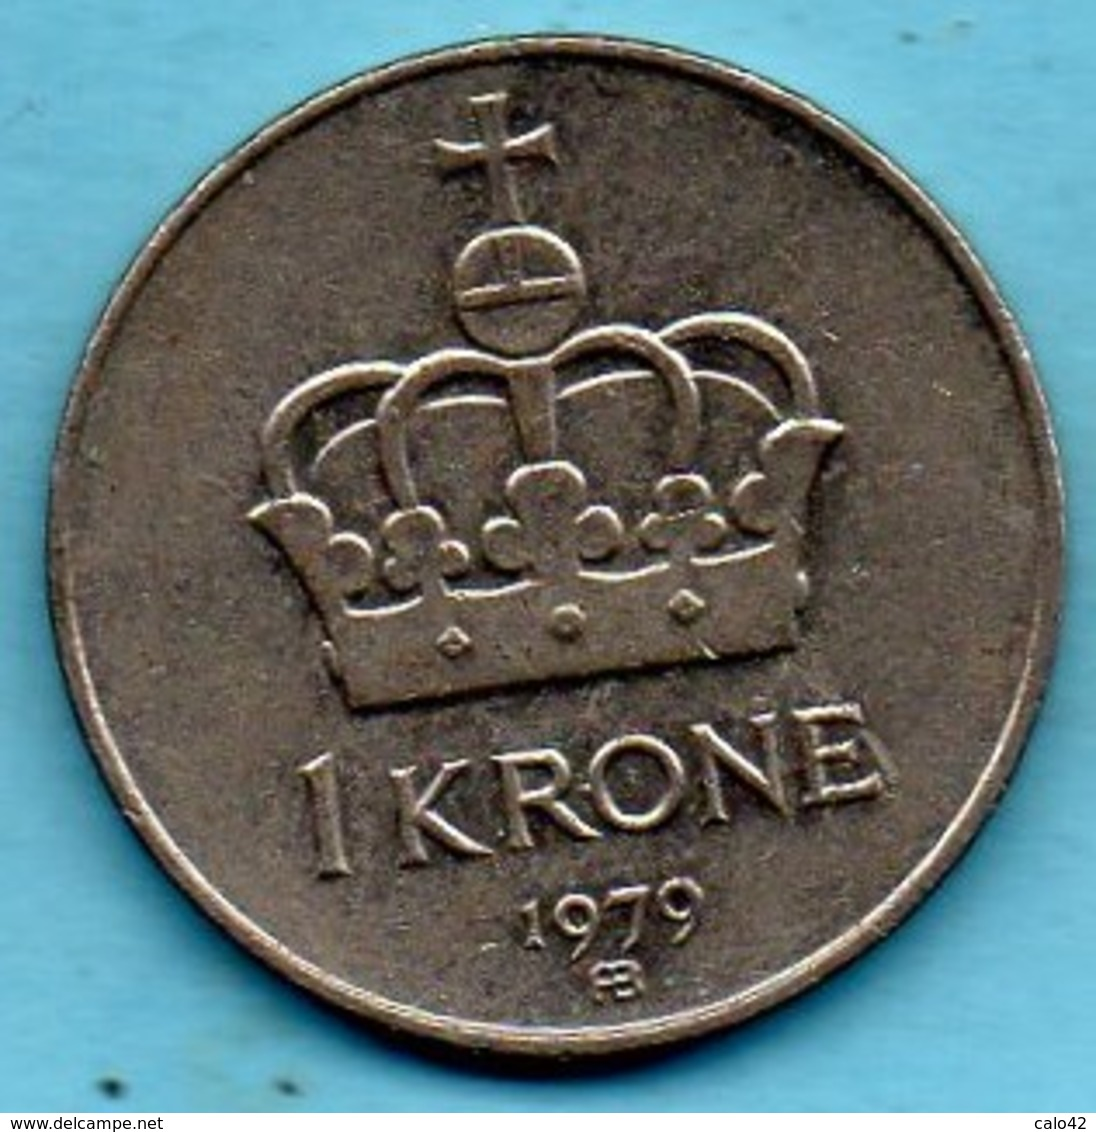 NORWAY / NORVEGE  1 Krone 1979 AB  KM#419 - Norvège